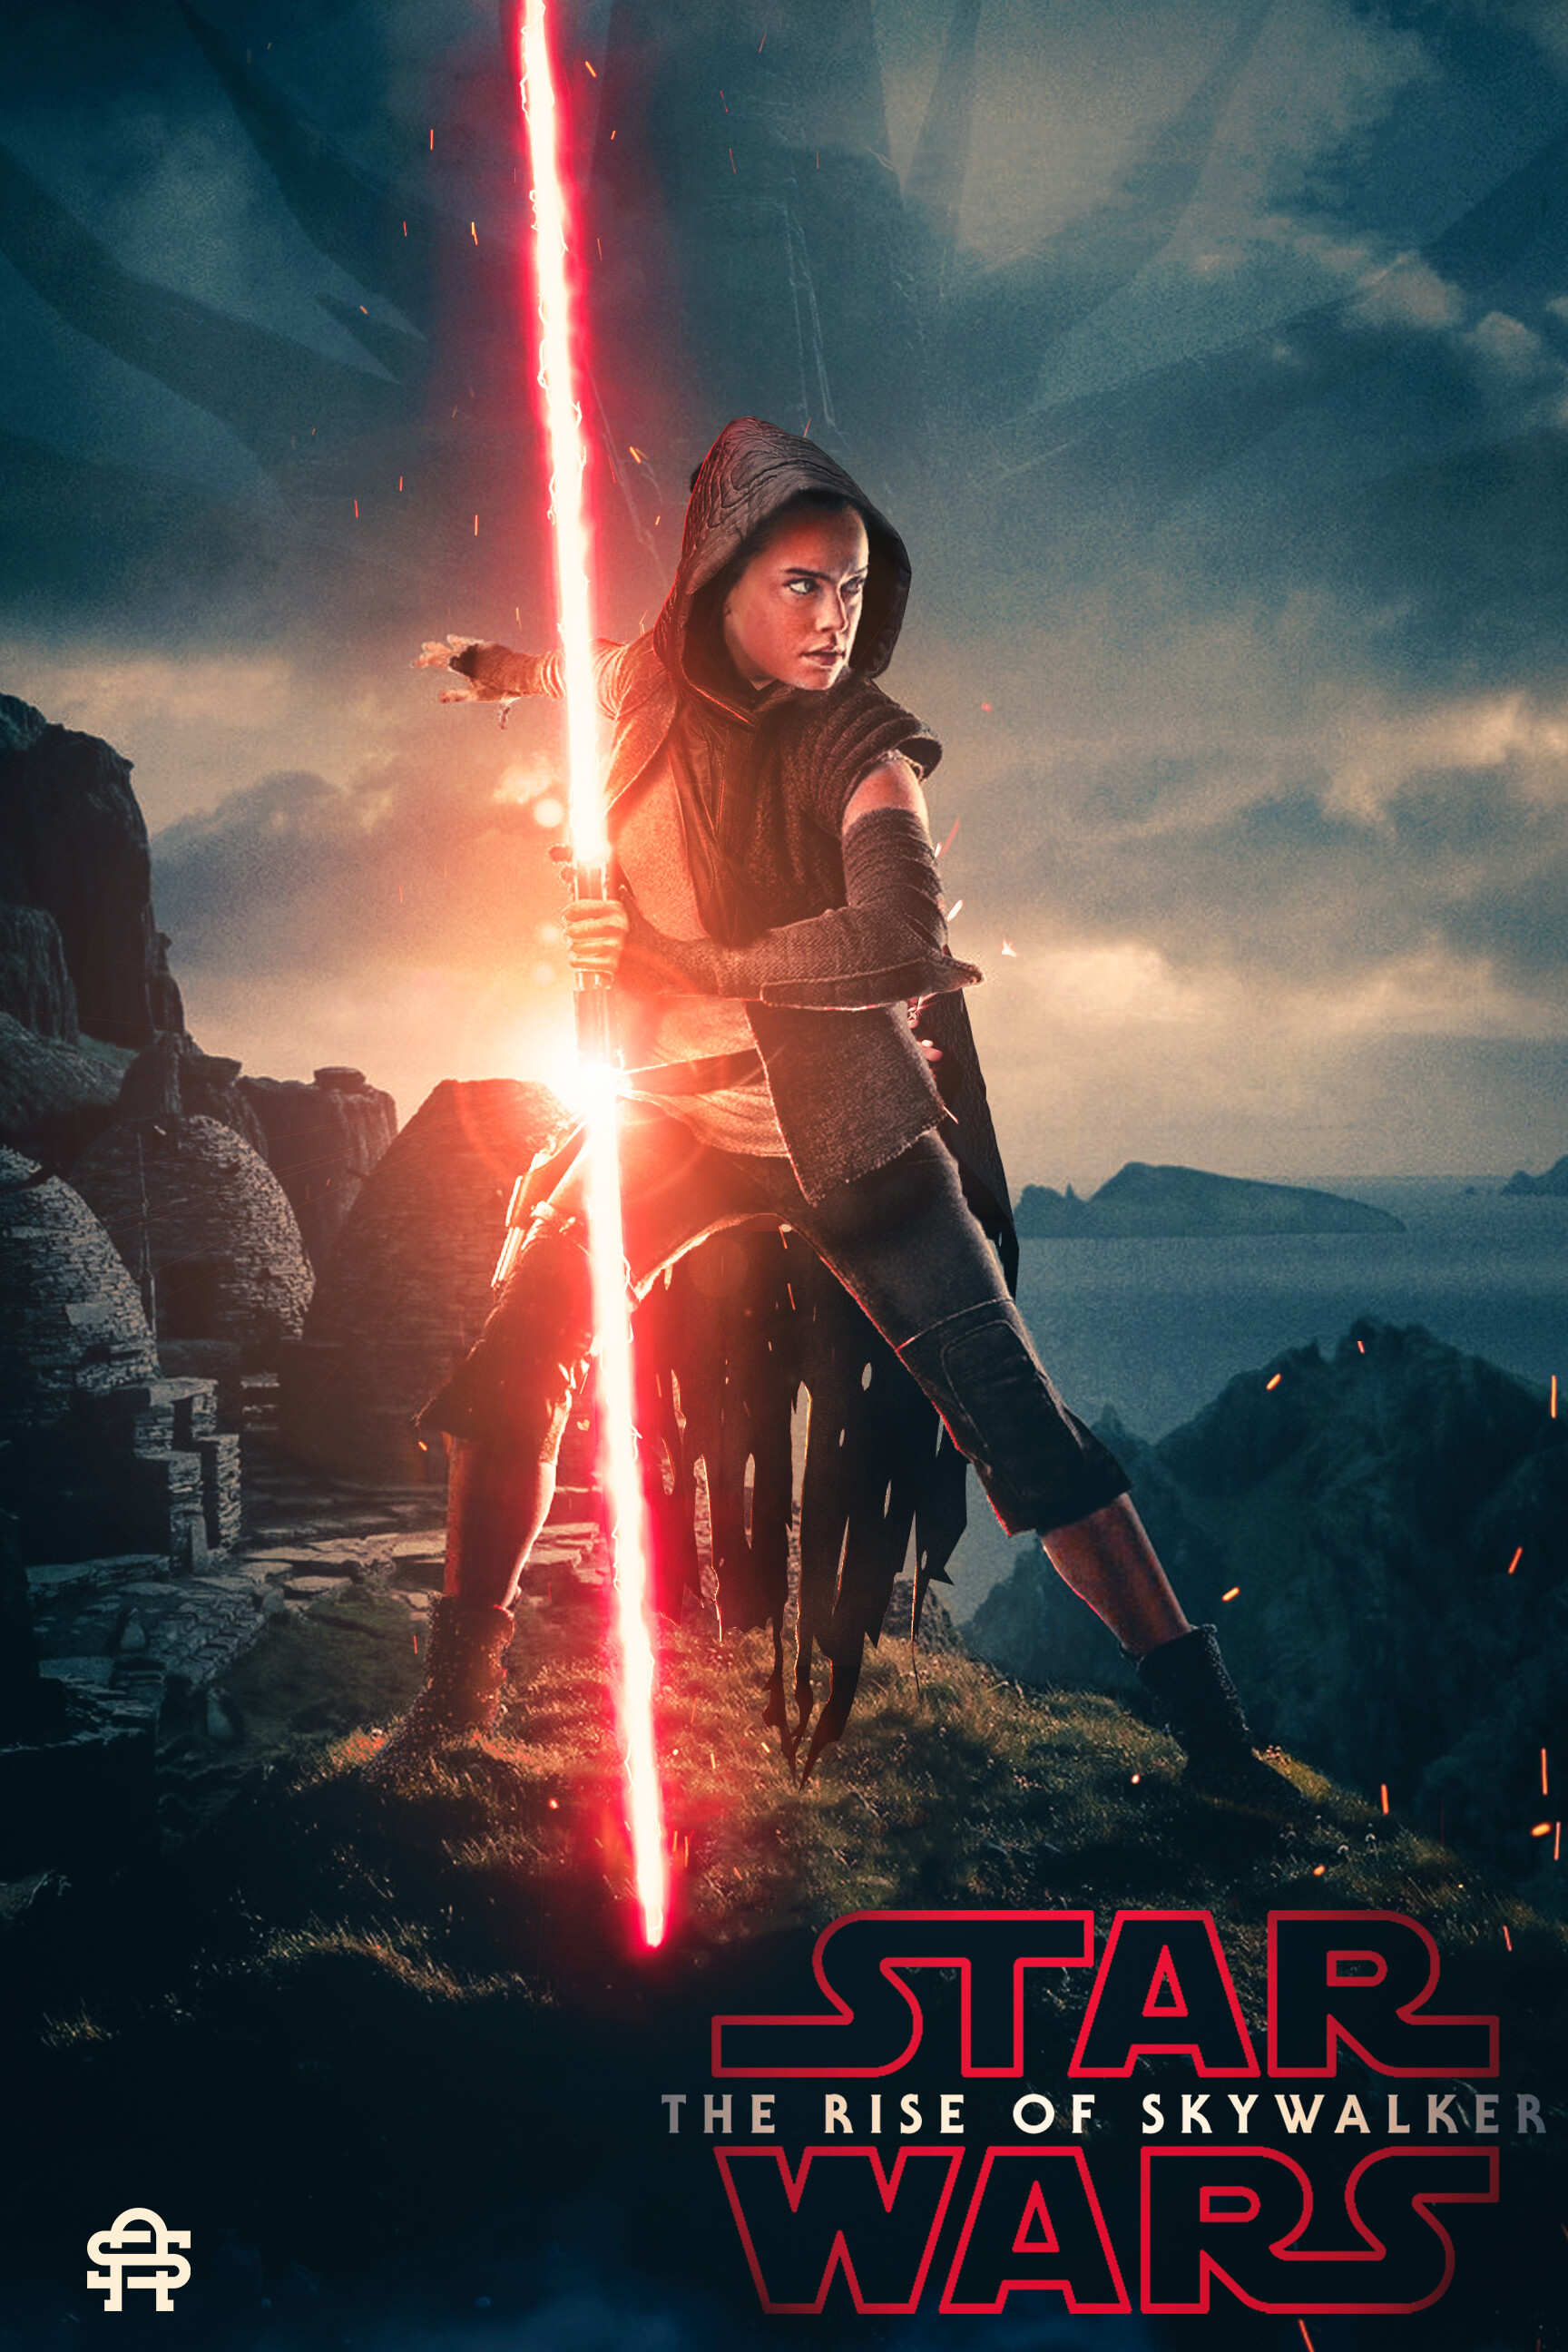 Artstation Starwars Rise Of Skywalker Darkside Artwork Hannan Shaikh Sneakyarts